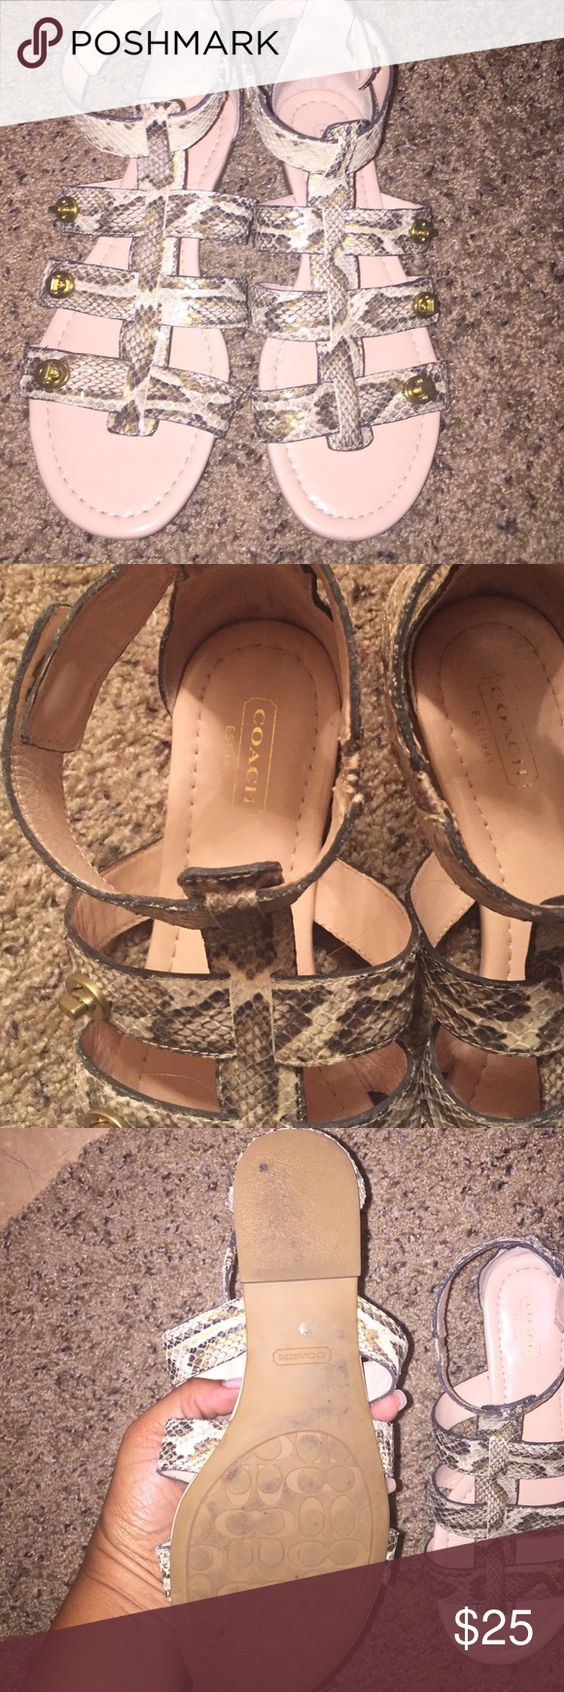 Coach sandals Snake print leather Coach sandals. Great condition Coach Shoes Sandals